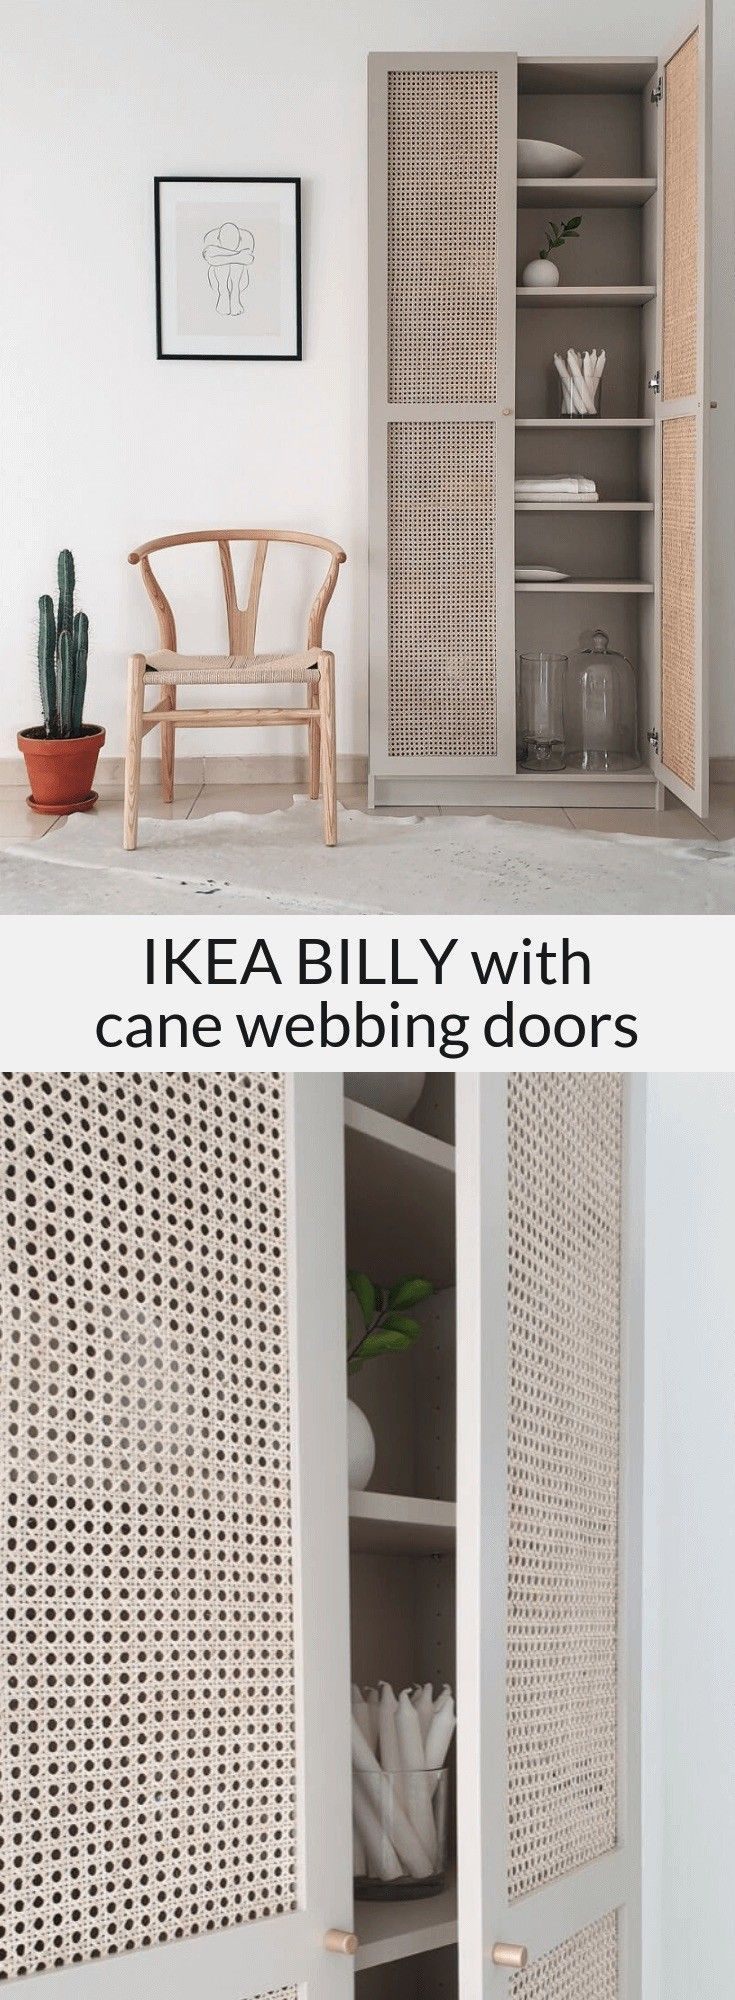 Photo of IKEA BILLY cane furniture hack featuring custom cane webbing doors.-   IKEA BILL…